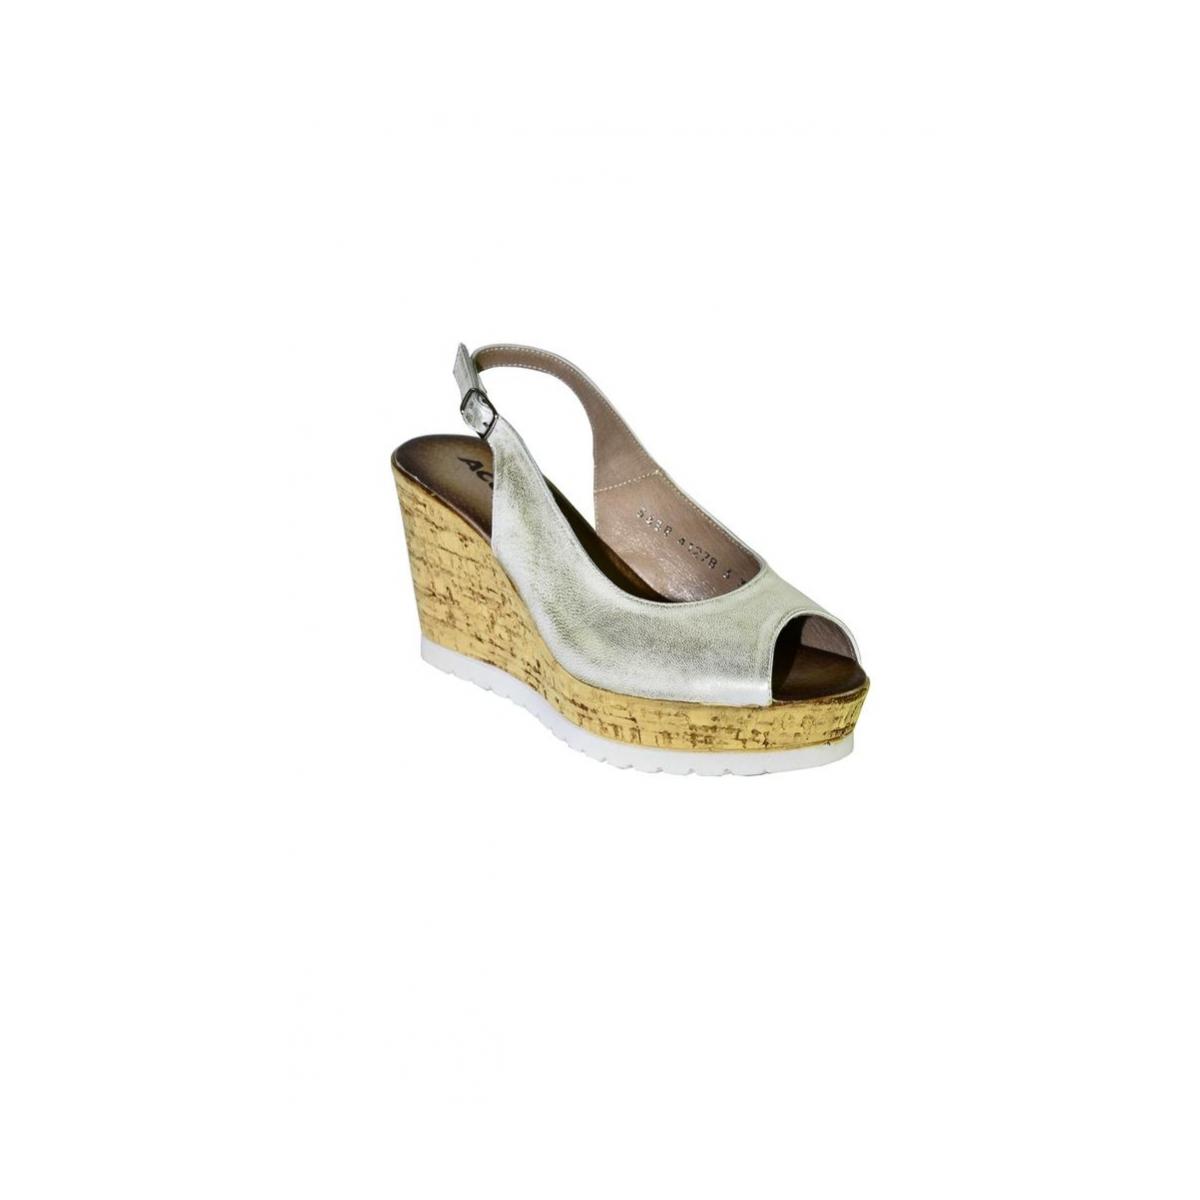 db77d9d8fae6 Dámske letné zlaté sandále NETANA - 6